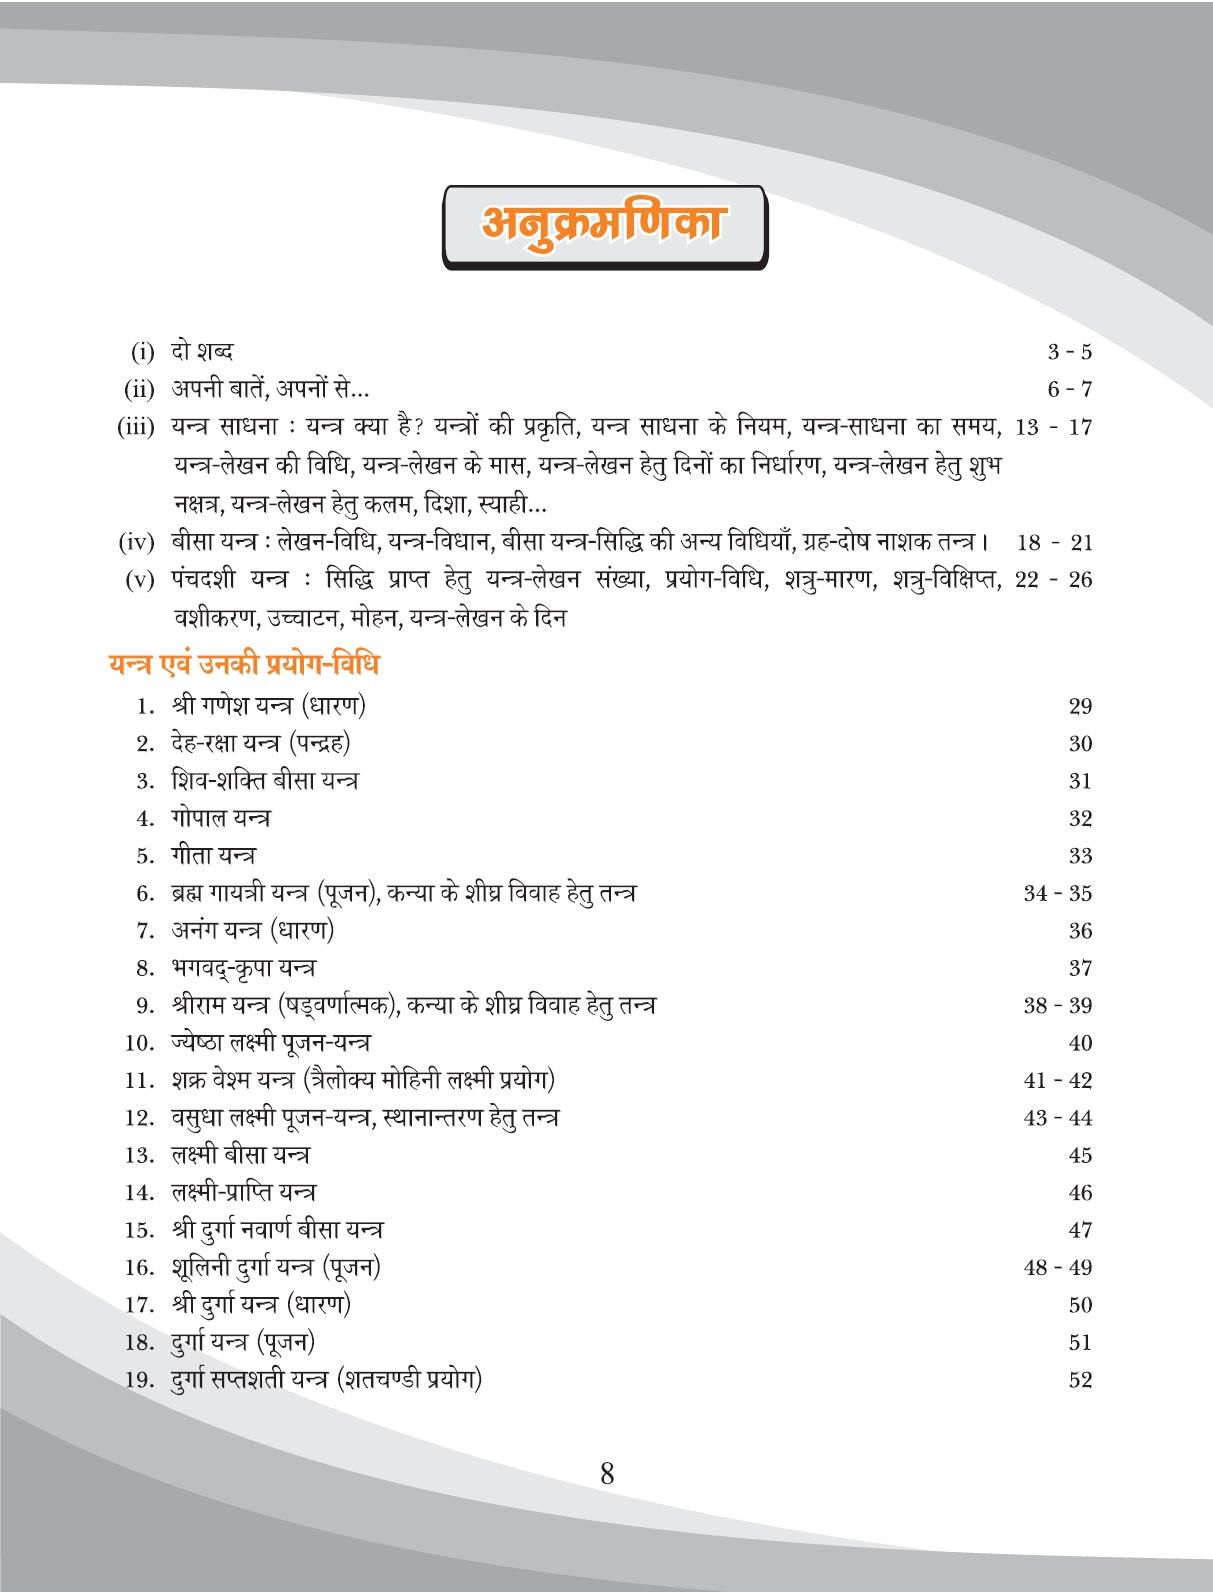 sri chakra puja vidhi pdf download